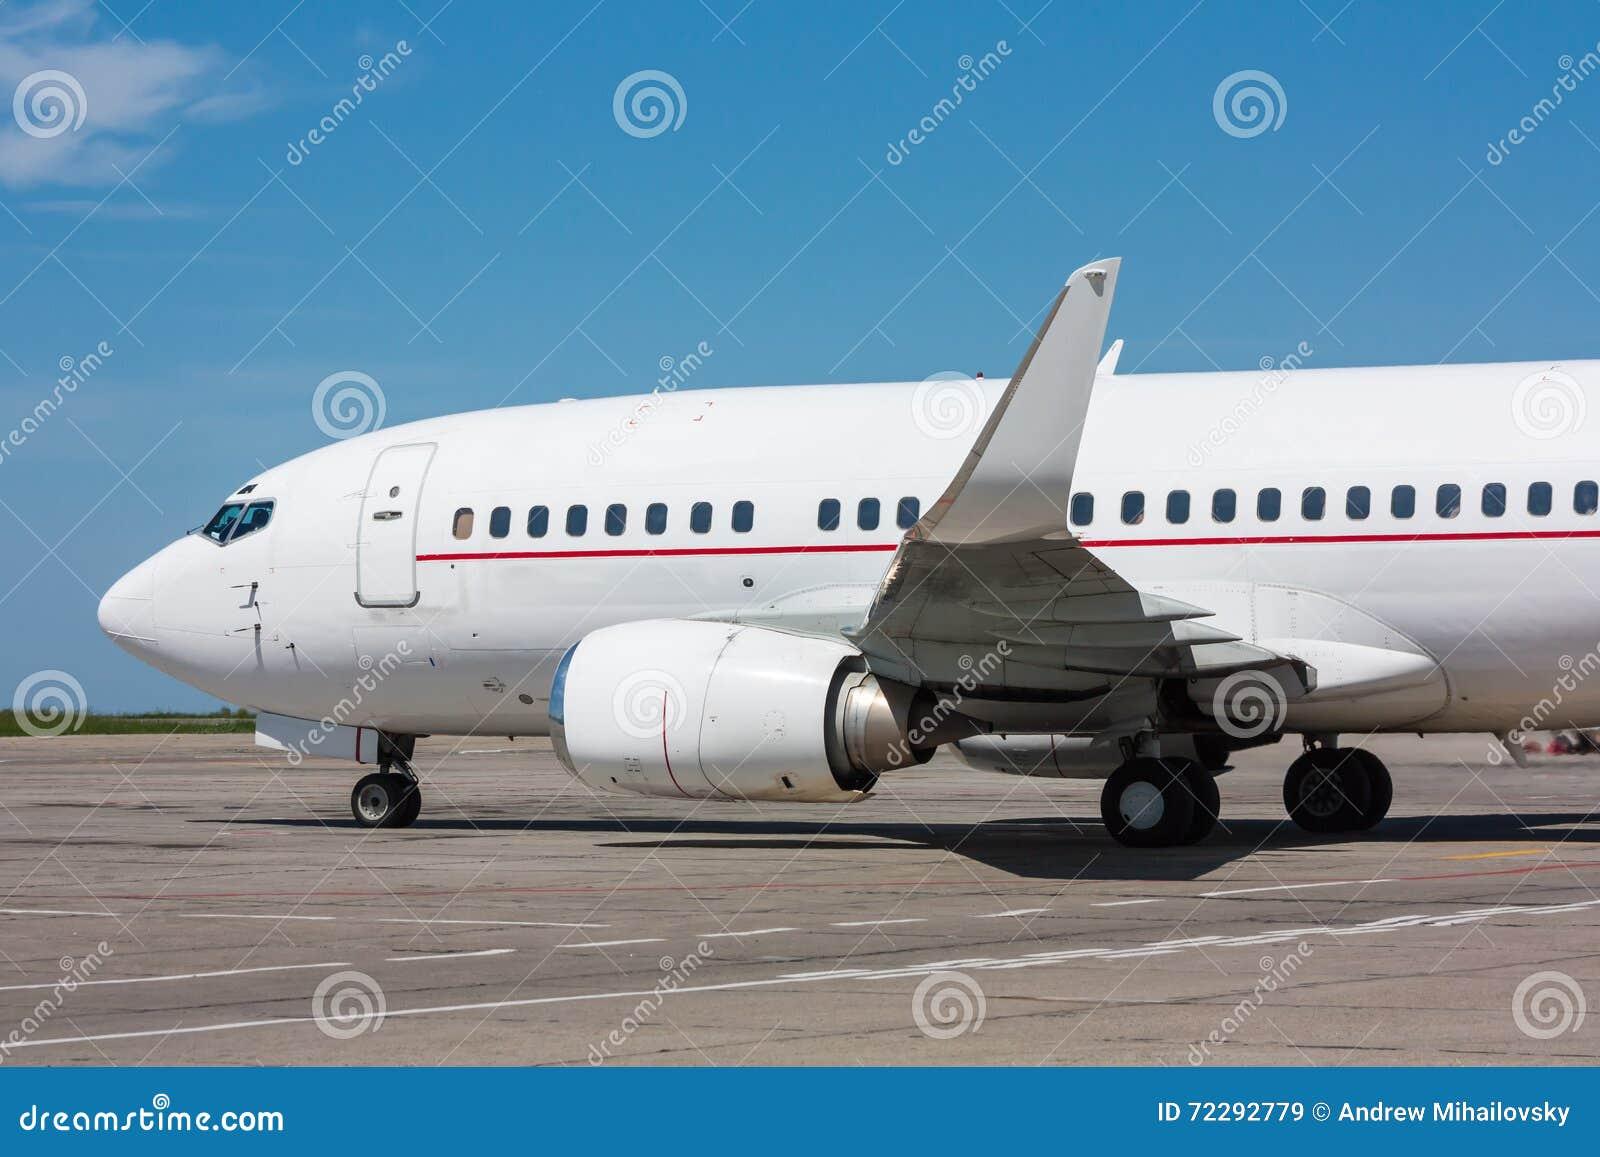 Ездя на такси самолет на рисберме авиапорта